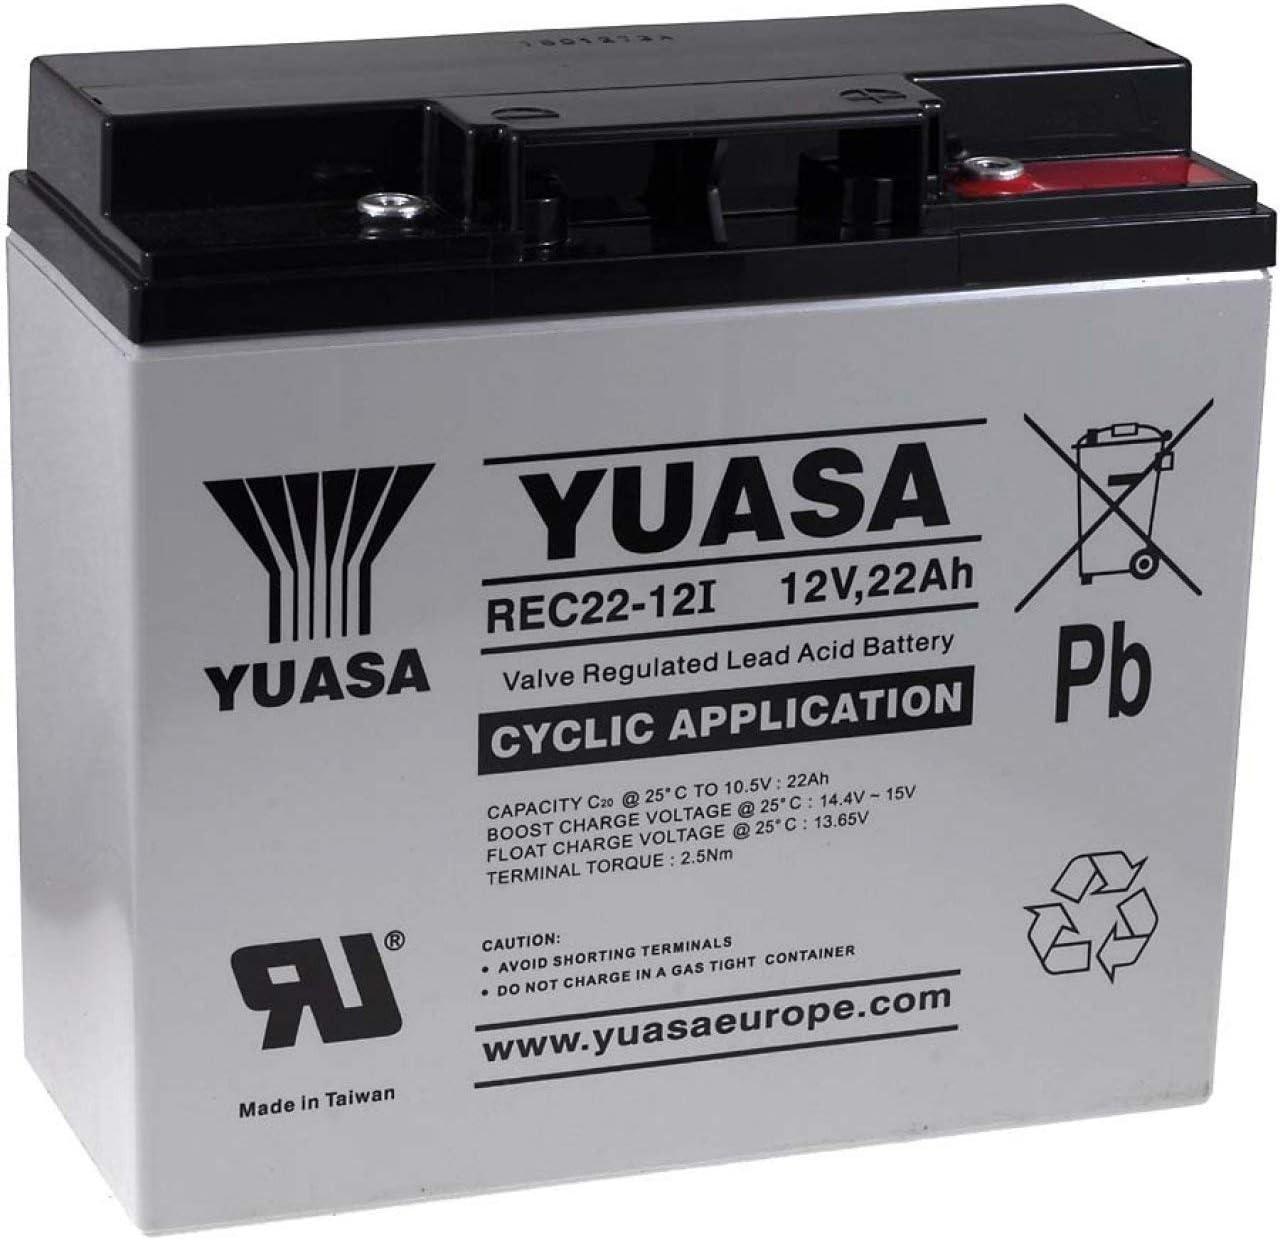 YUASA Batería de Reemplazo para Carro de Golf Sillas de ruedas Autocaravanas Scooter eléctrico 12V 22Ah cíclica